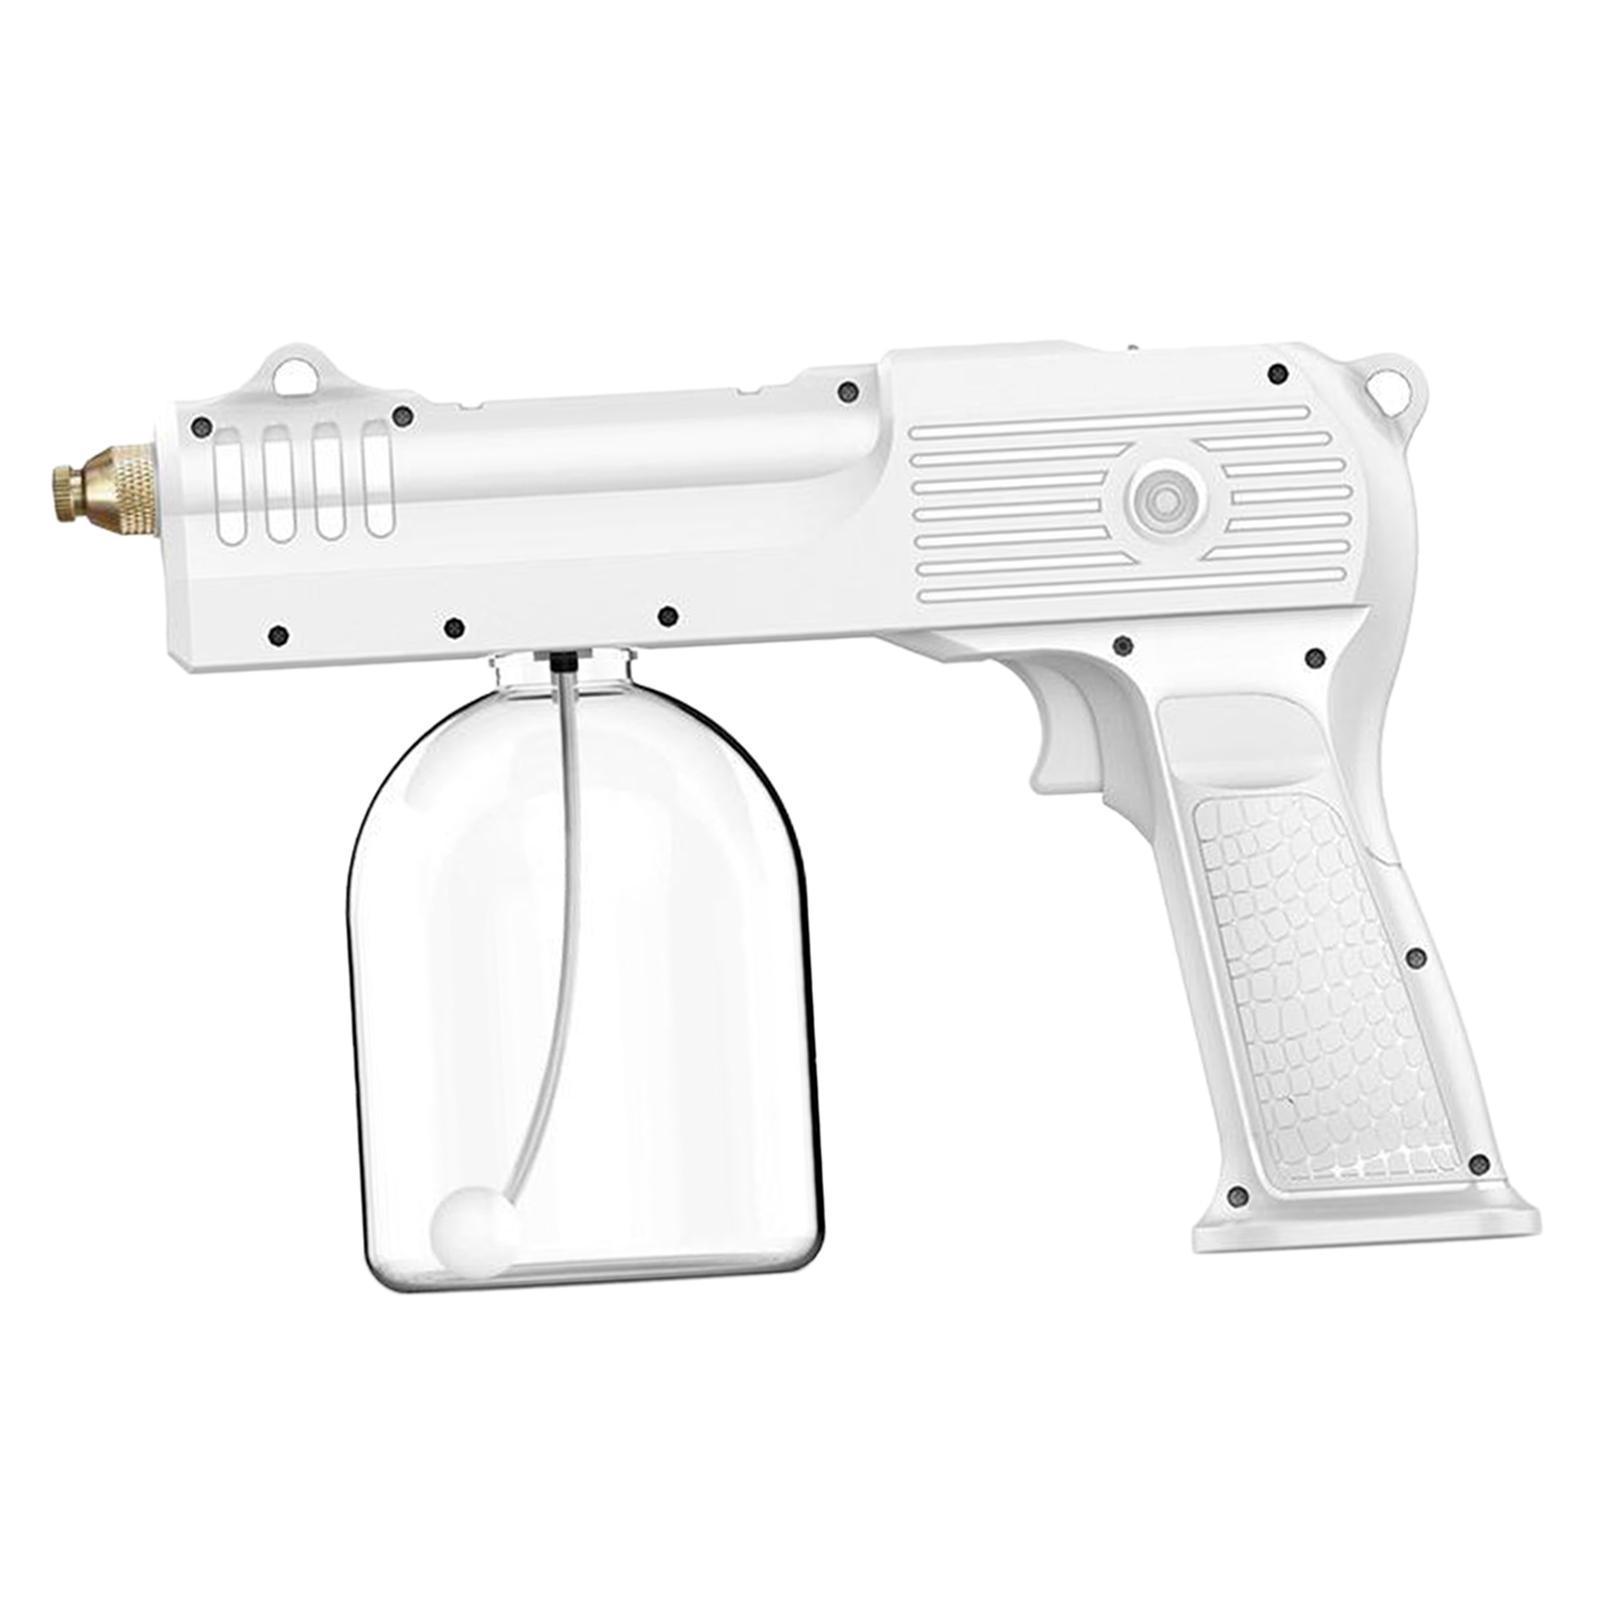 thumbnail 10 - 2x Cordless USB Nano Sanitizer Sprayer Disinfectant Fogger 500ml Spray Gun